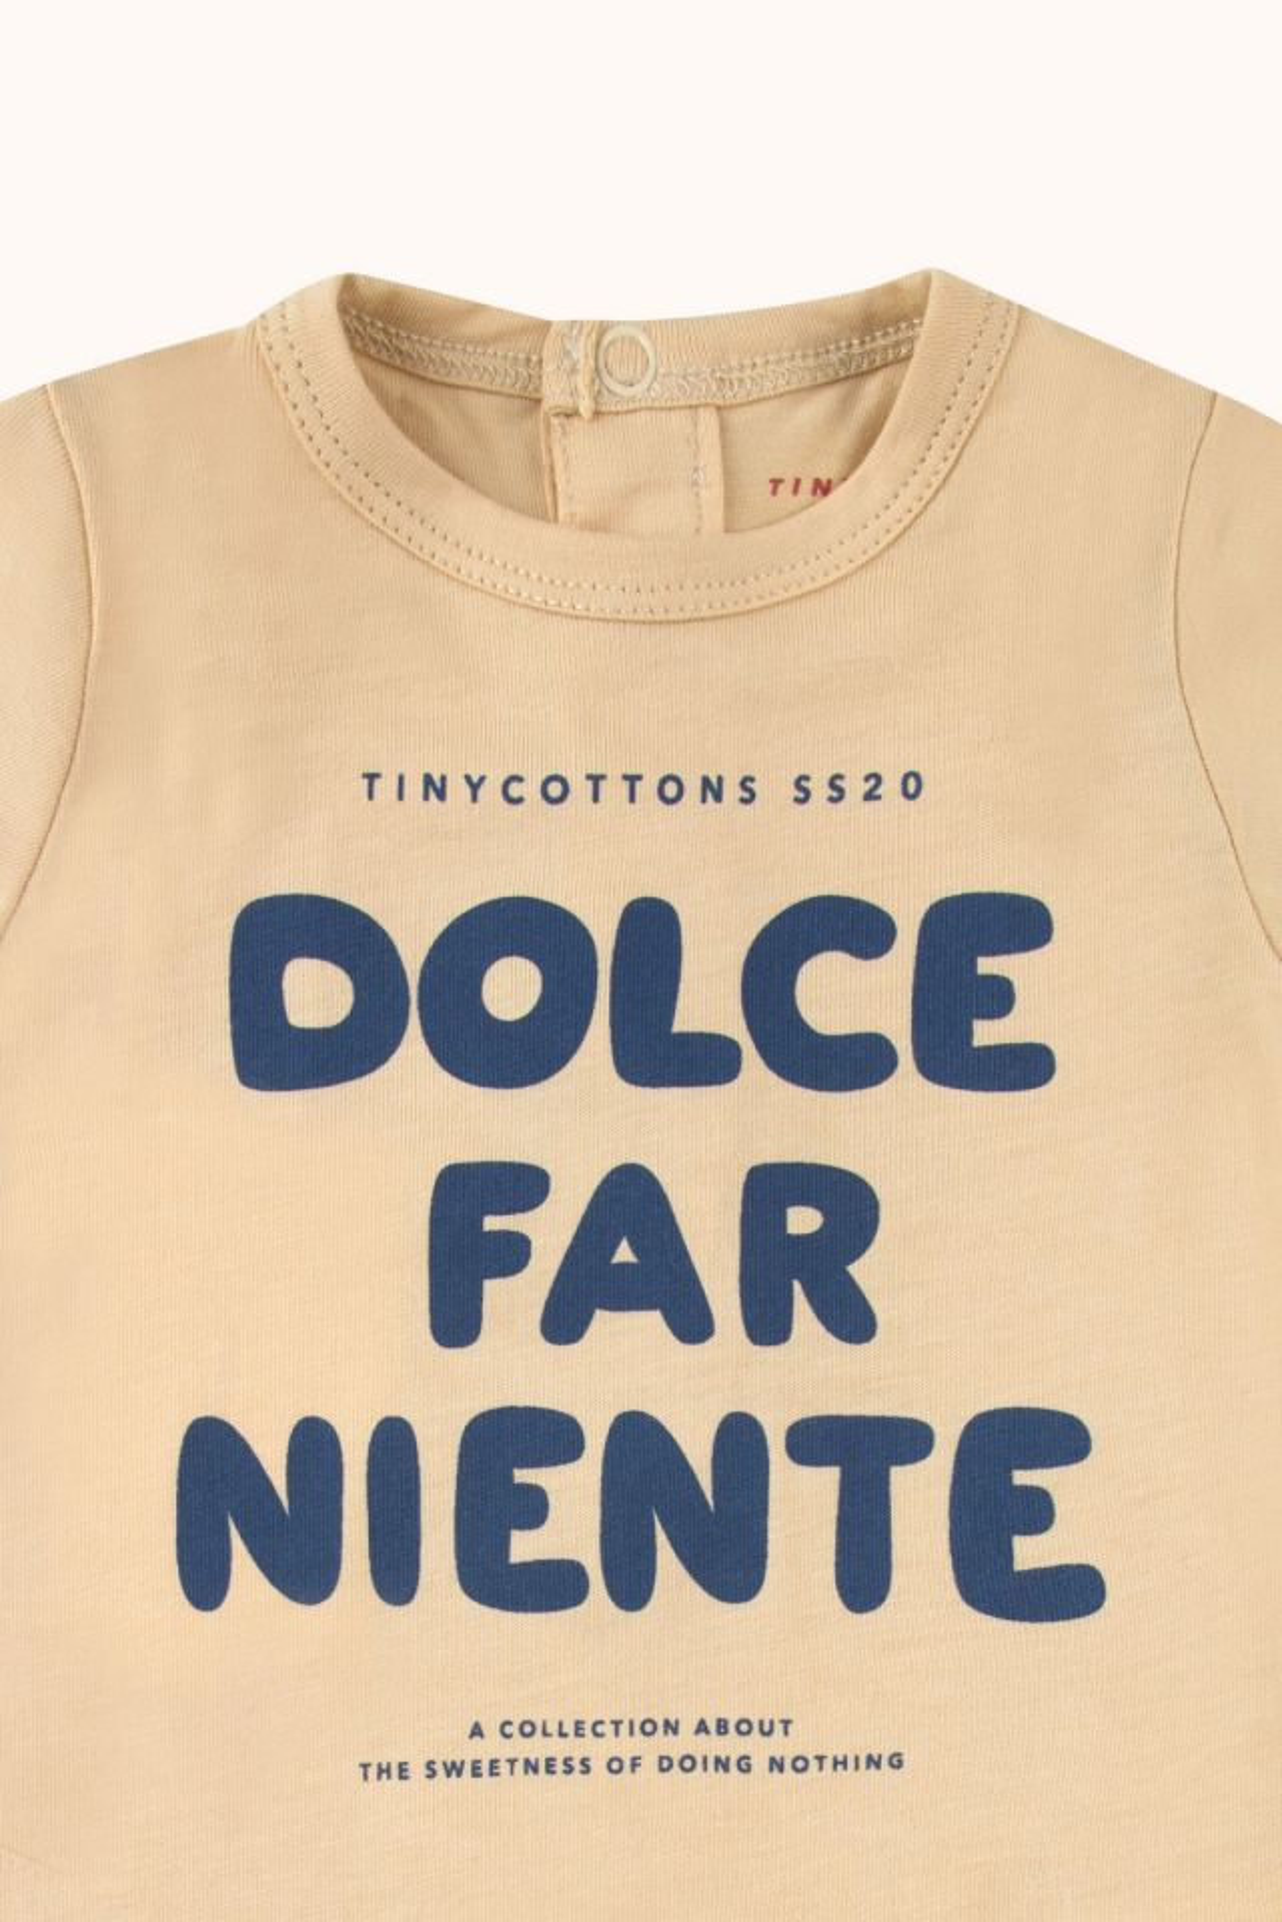 """DOLCE FAR NIENTE"" BODY"